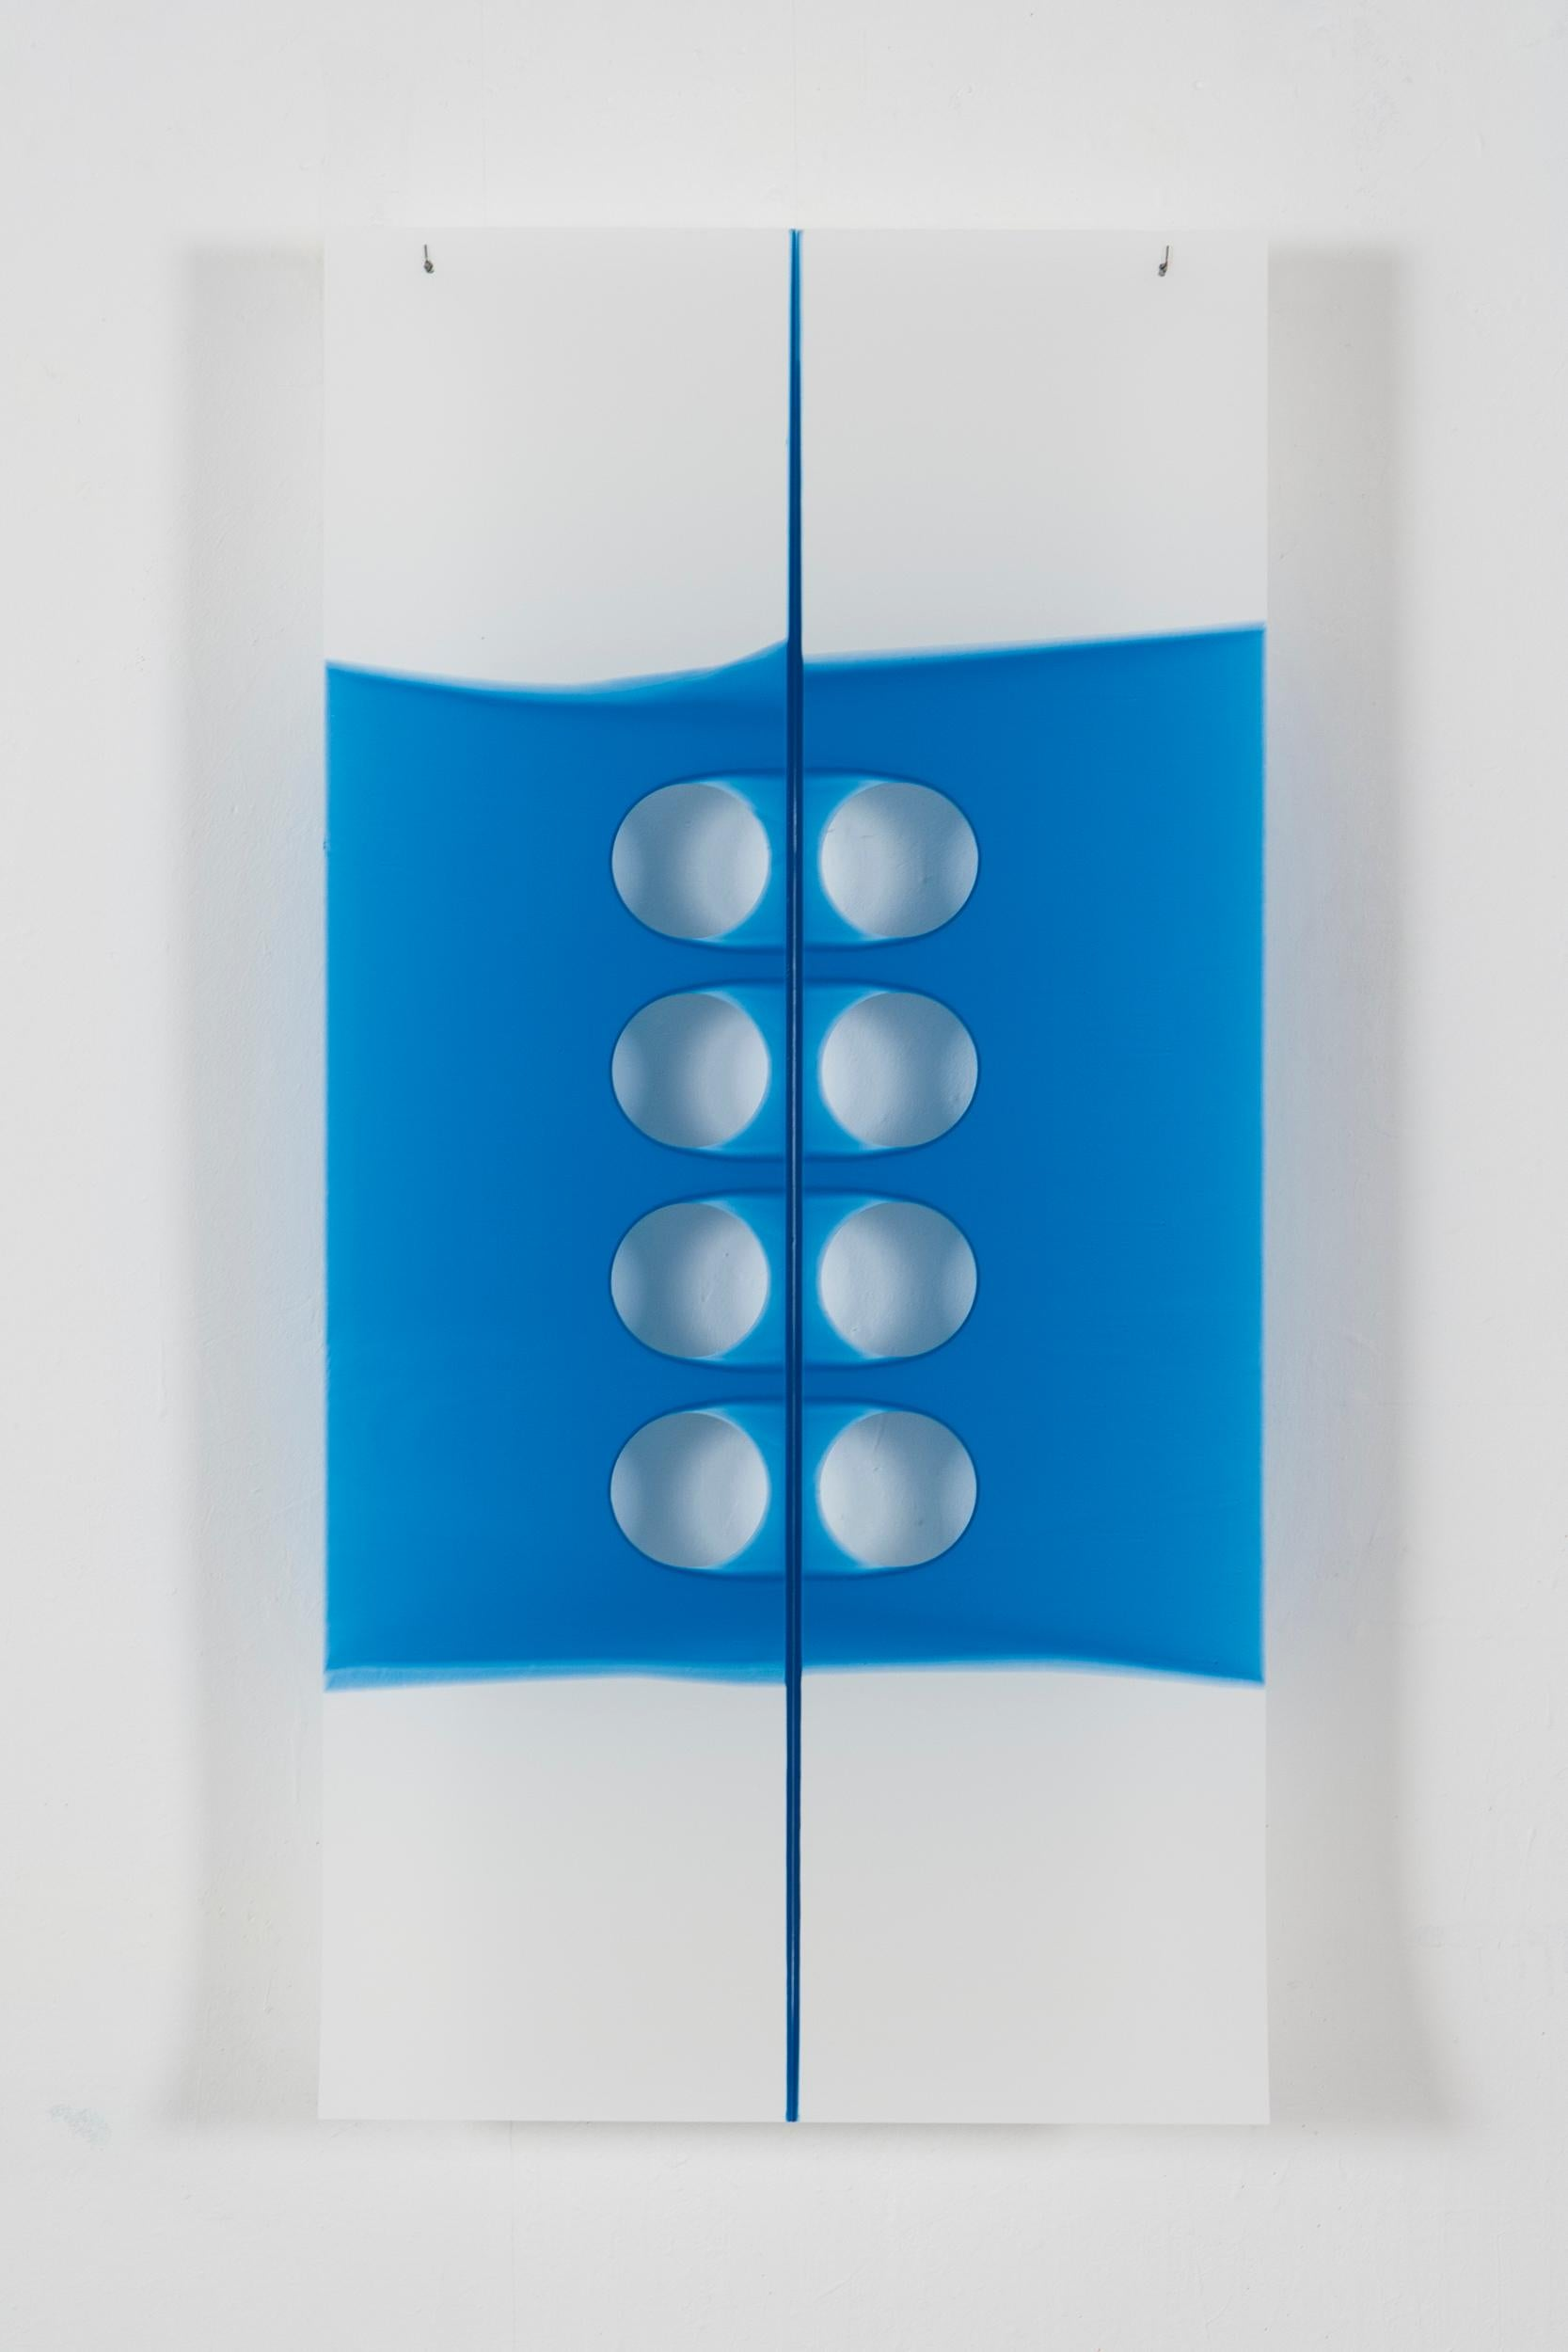 Mary Schiliro, Cat's Cradle 7, 2006, acylic on Mylar, 36 x 18 inches, Abstract